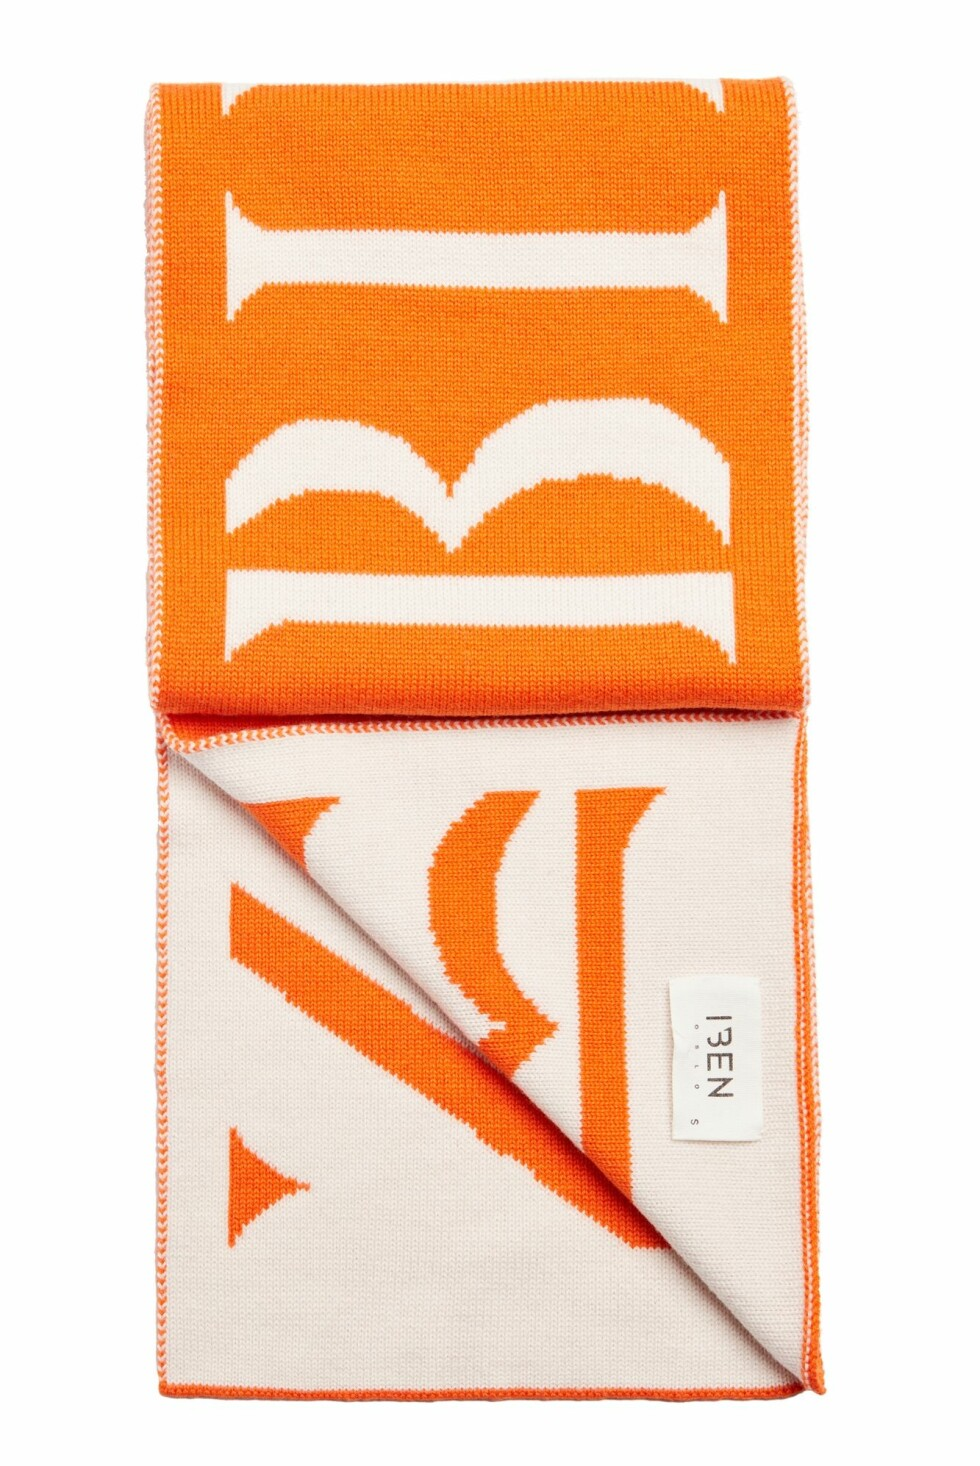 Skjerf fra Iben |1500,-| http://ibenofficial.tictail.com/product/pre-order-mars-scarf